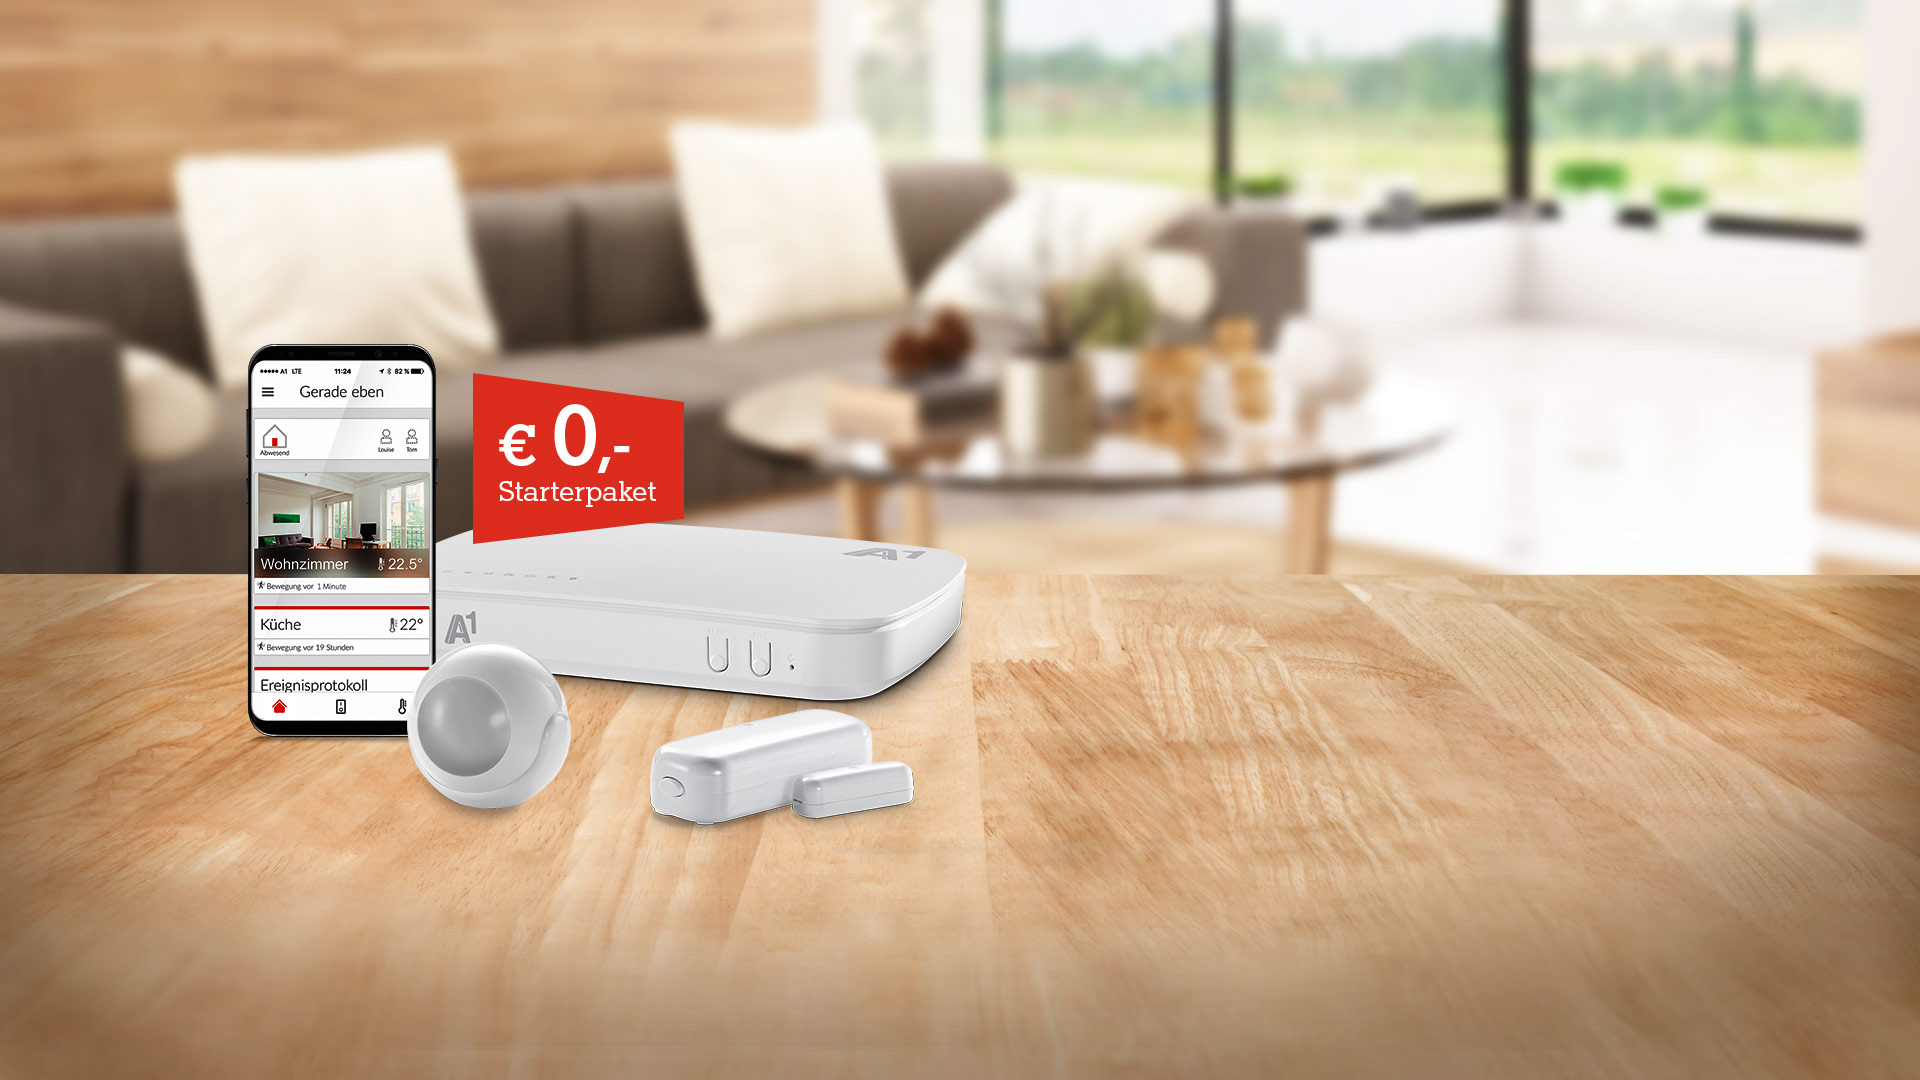 A1 Smart Home - Starterpaket um € 0,-